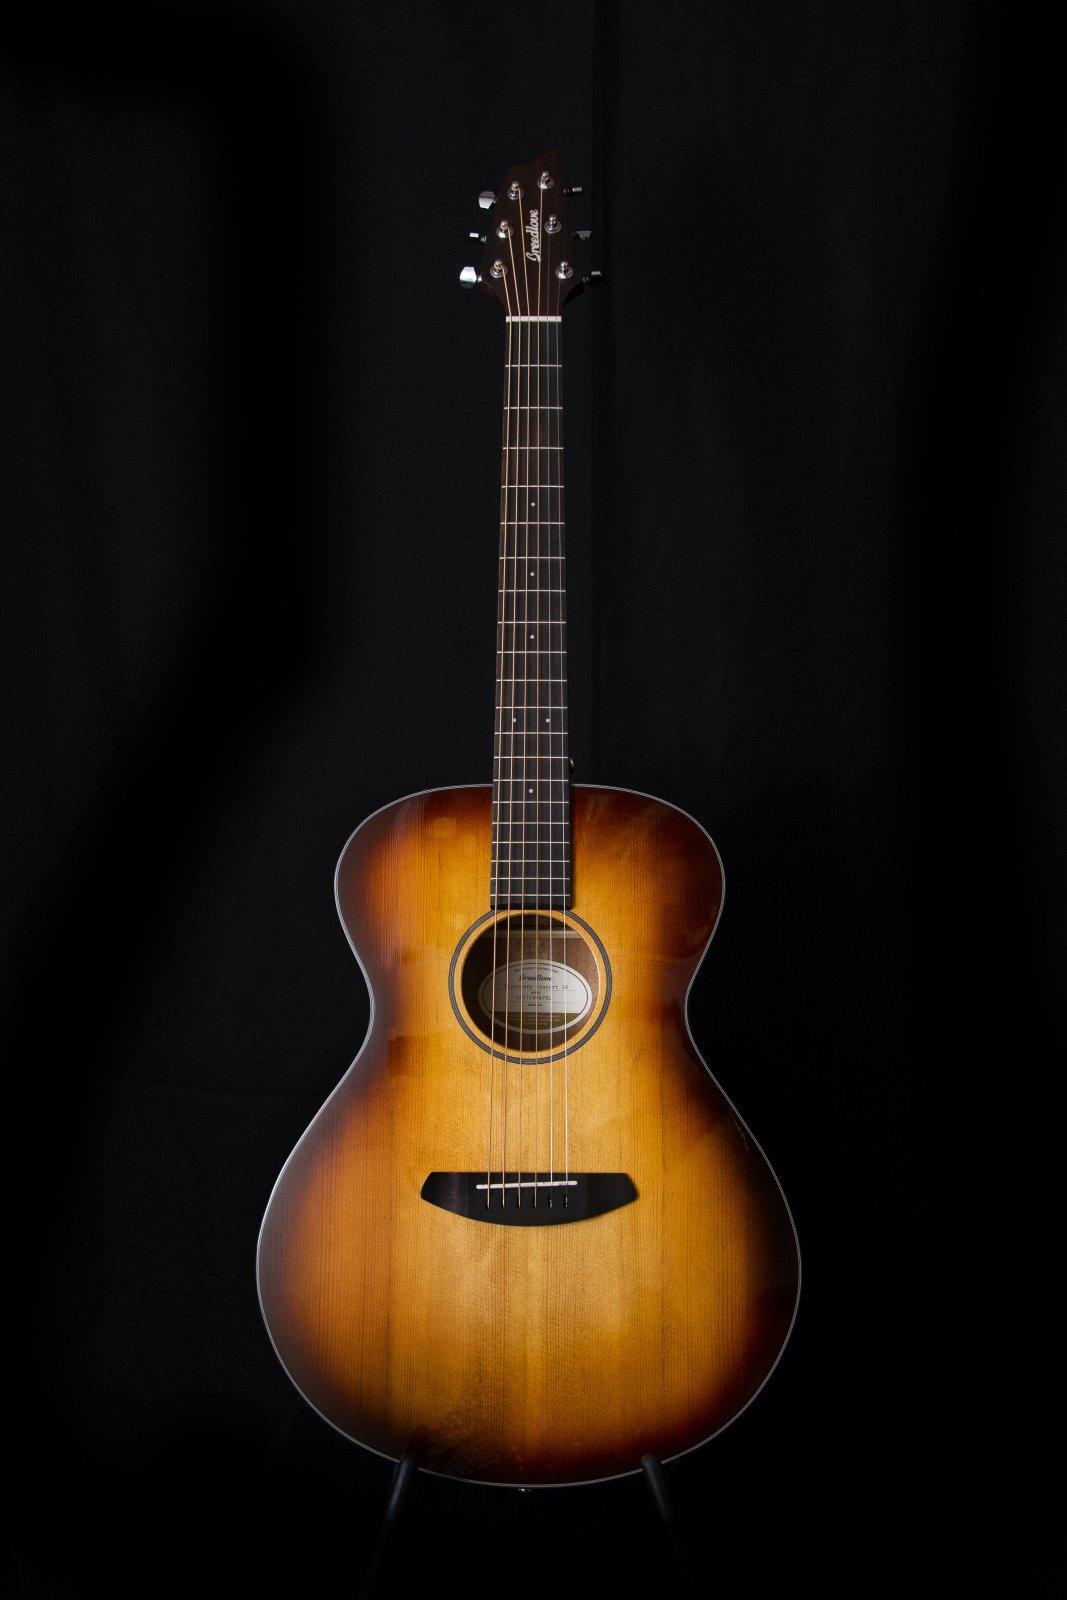 Breedlove Discovery Concert Sunburst Sitka/Mahogany Guitar